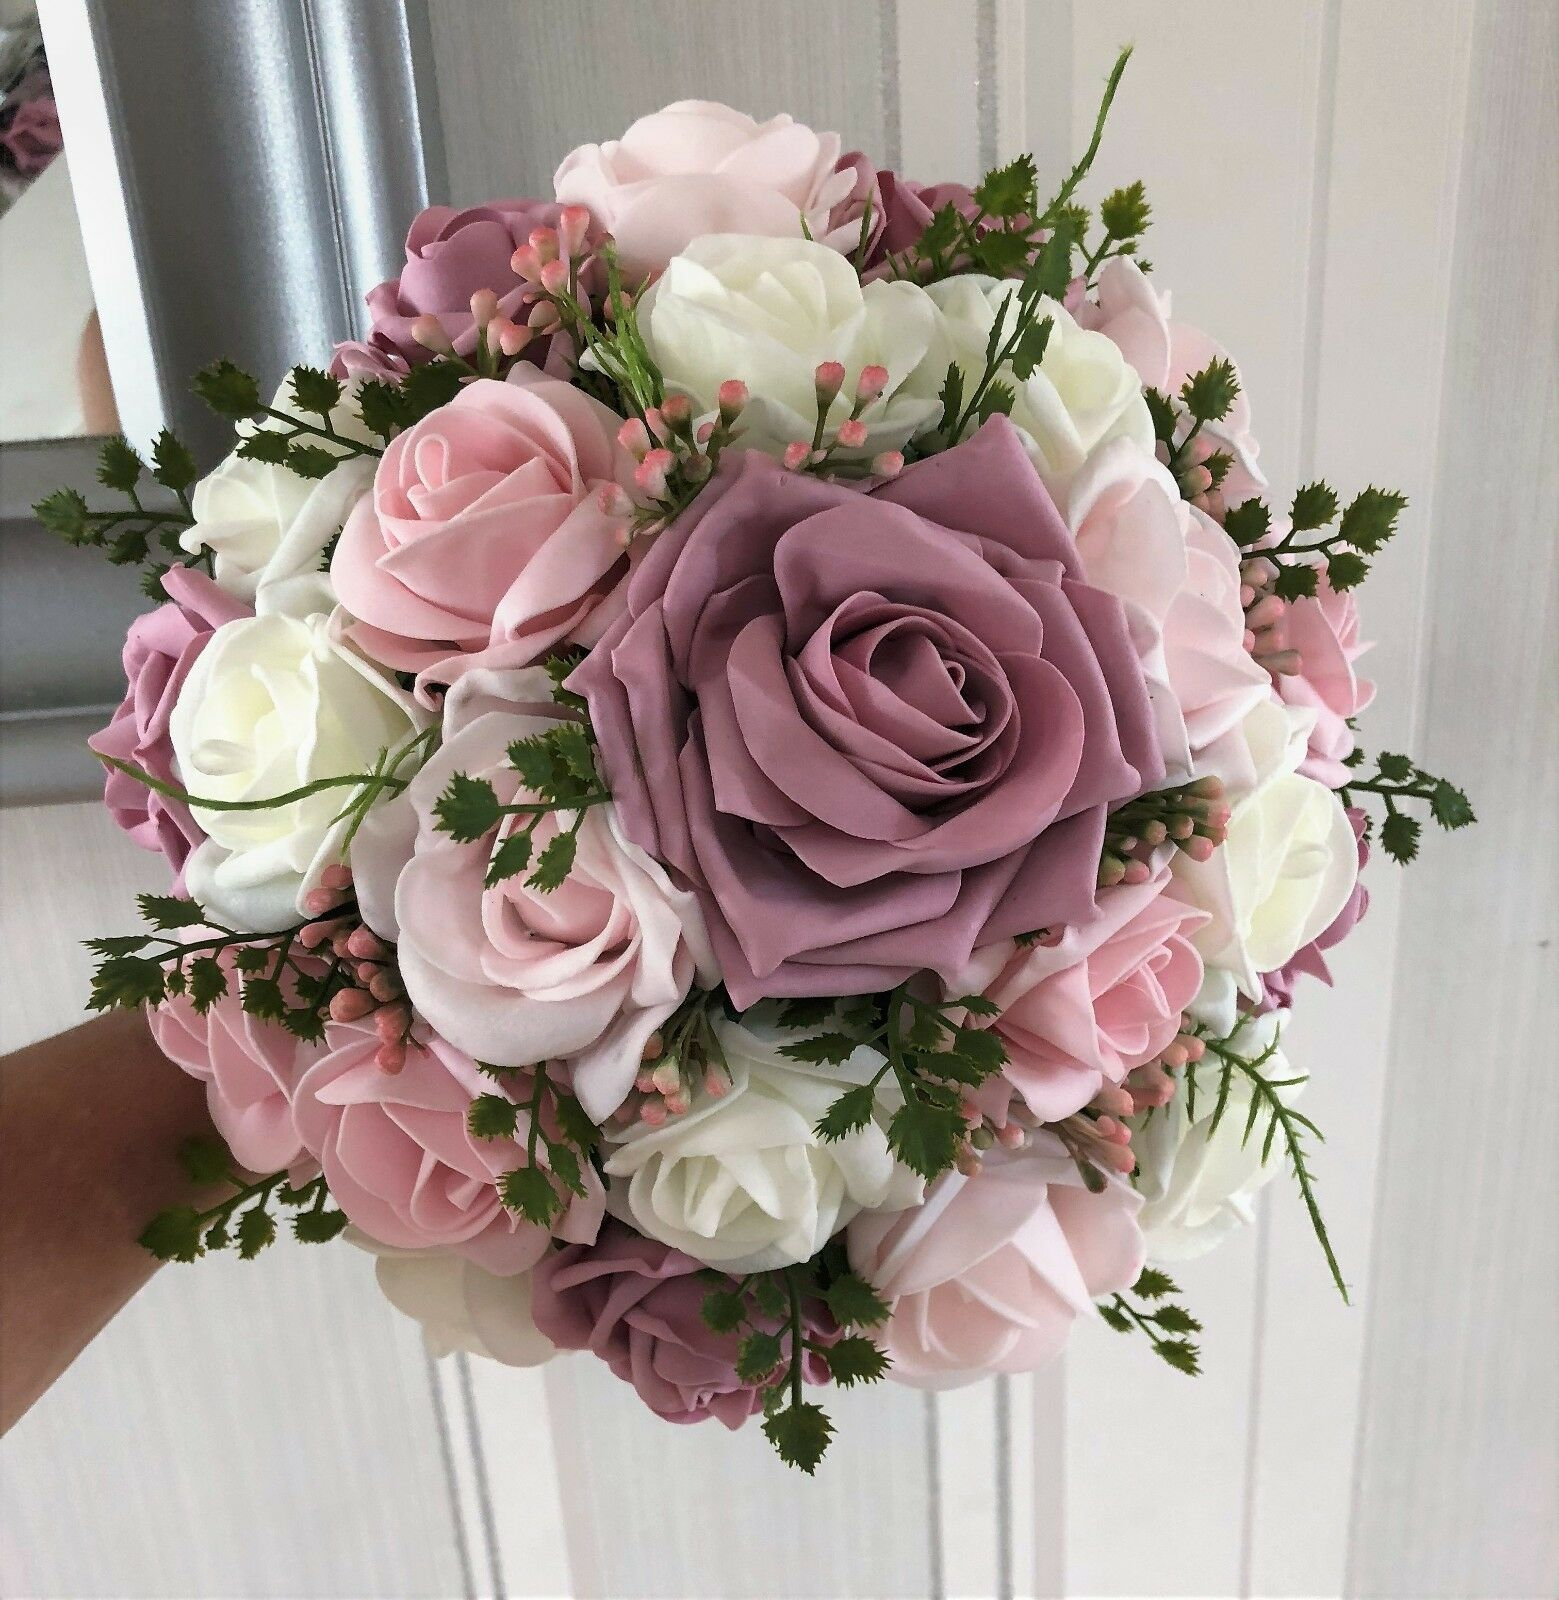 Mariage fleurs ivoire/brun, look rose et bébé rose, verdure look ivoire/brun, naturel 8ef235